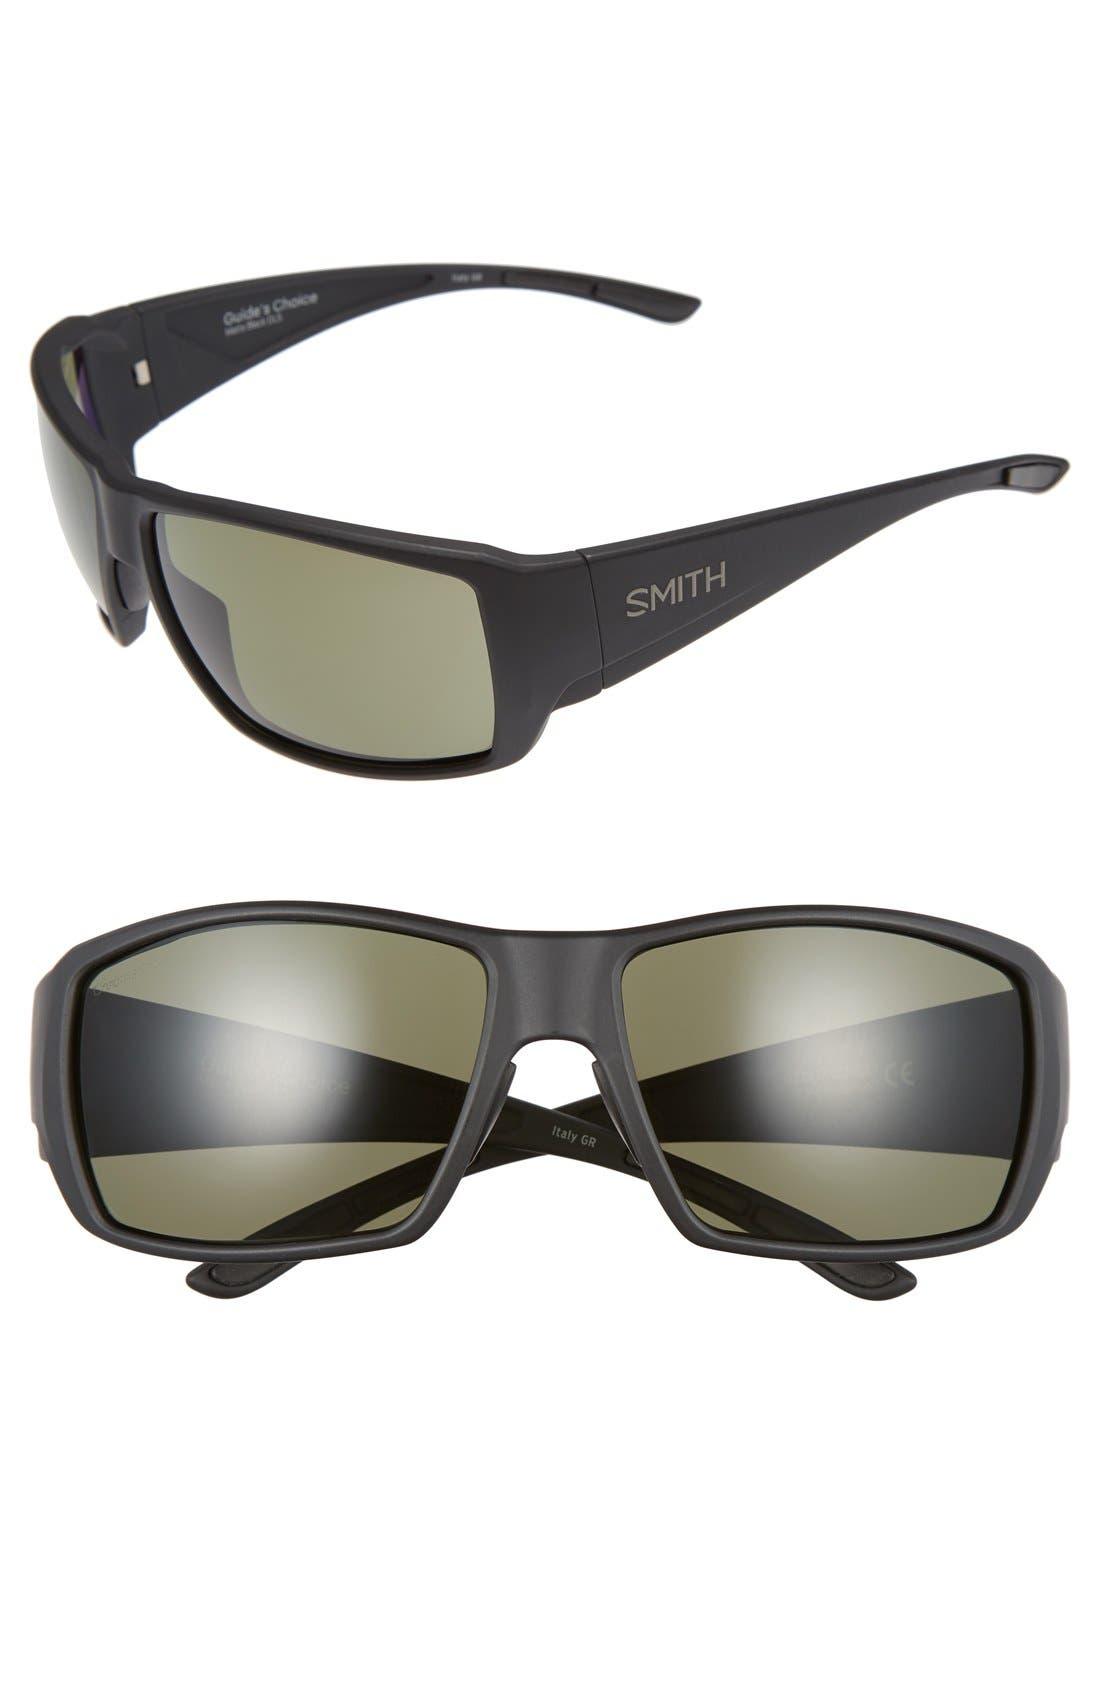 'Guide's Choice' 62mm Polarized Sunglasses,                             Main thumbnail 1, color,                             MATTE BLACK